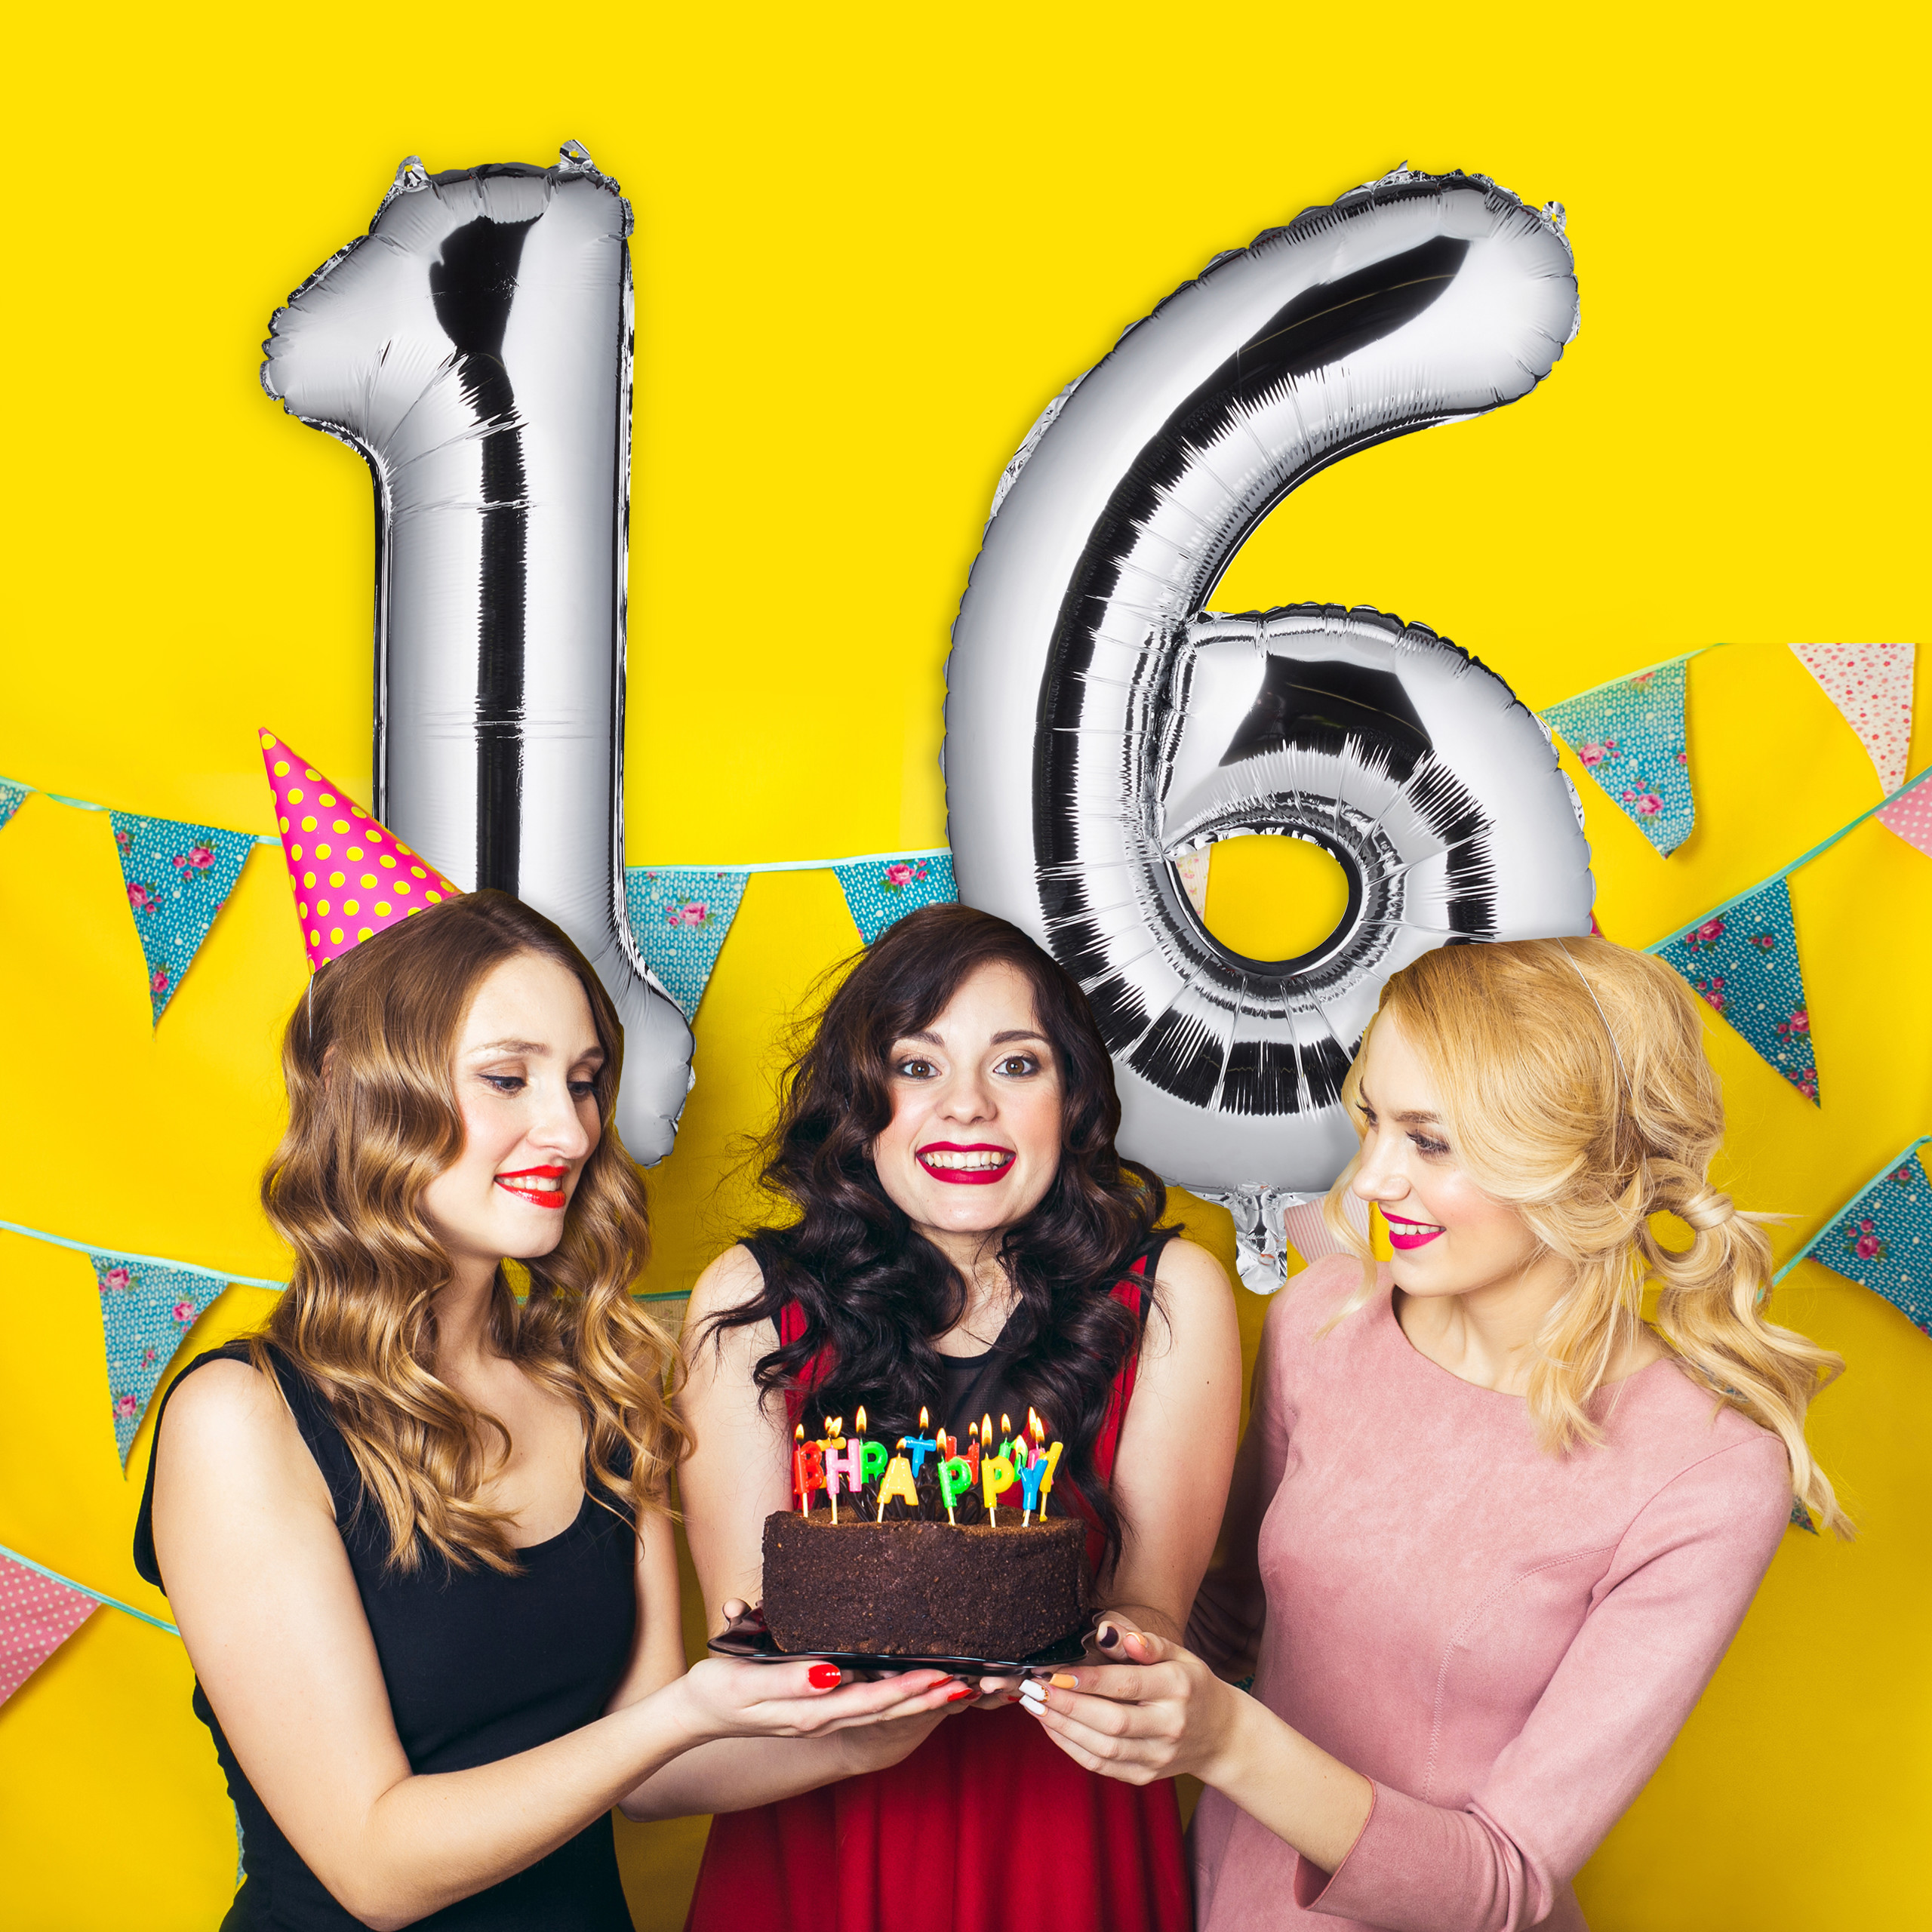 Folienballon Zahl 16 Folienzahl Riesenluftballon Geburtstag Zahlenballon Folie